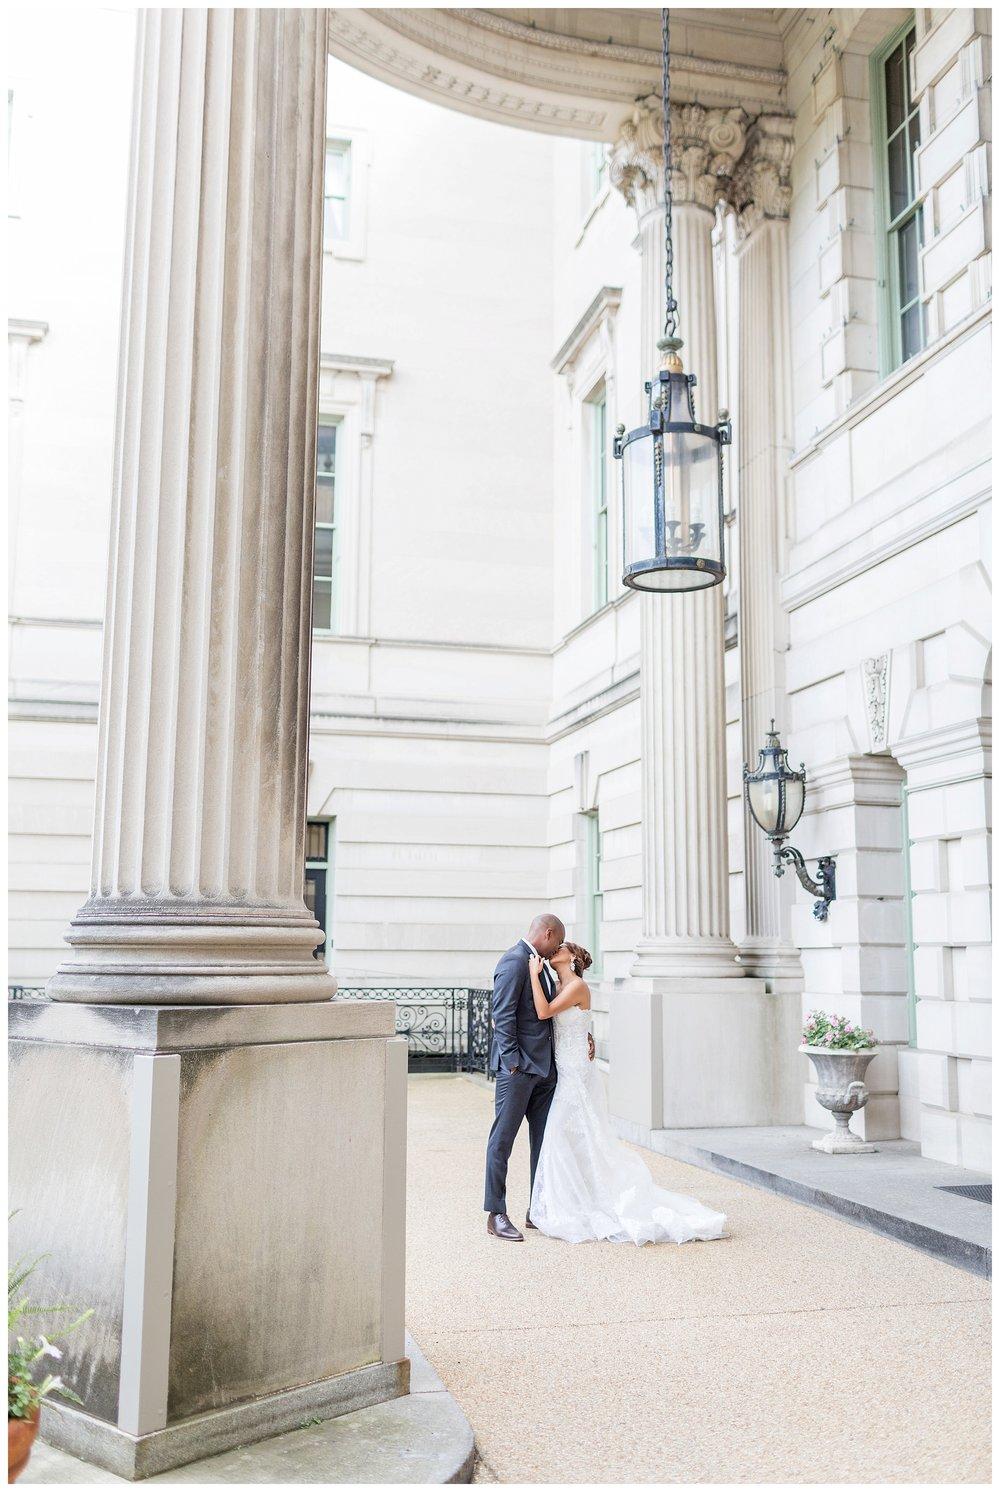 Anderson House Wedding DC Wedding Photographer Kir Tuben_0045.jpg